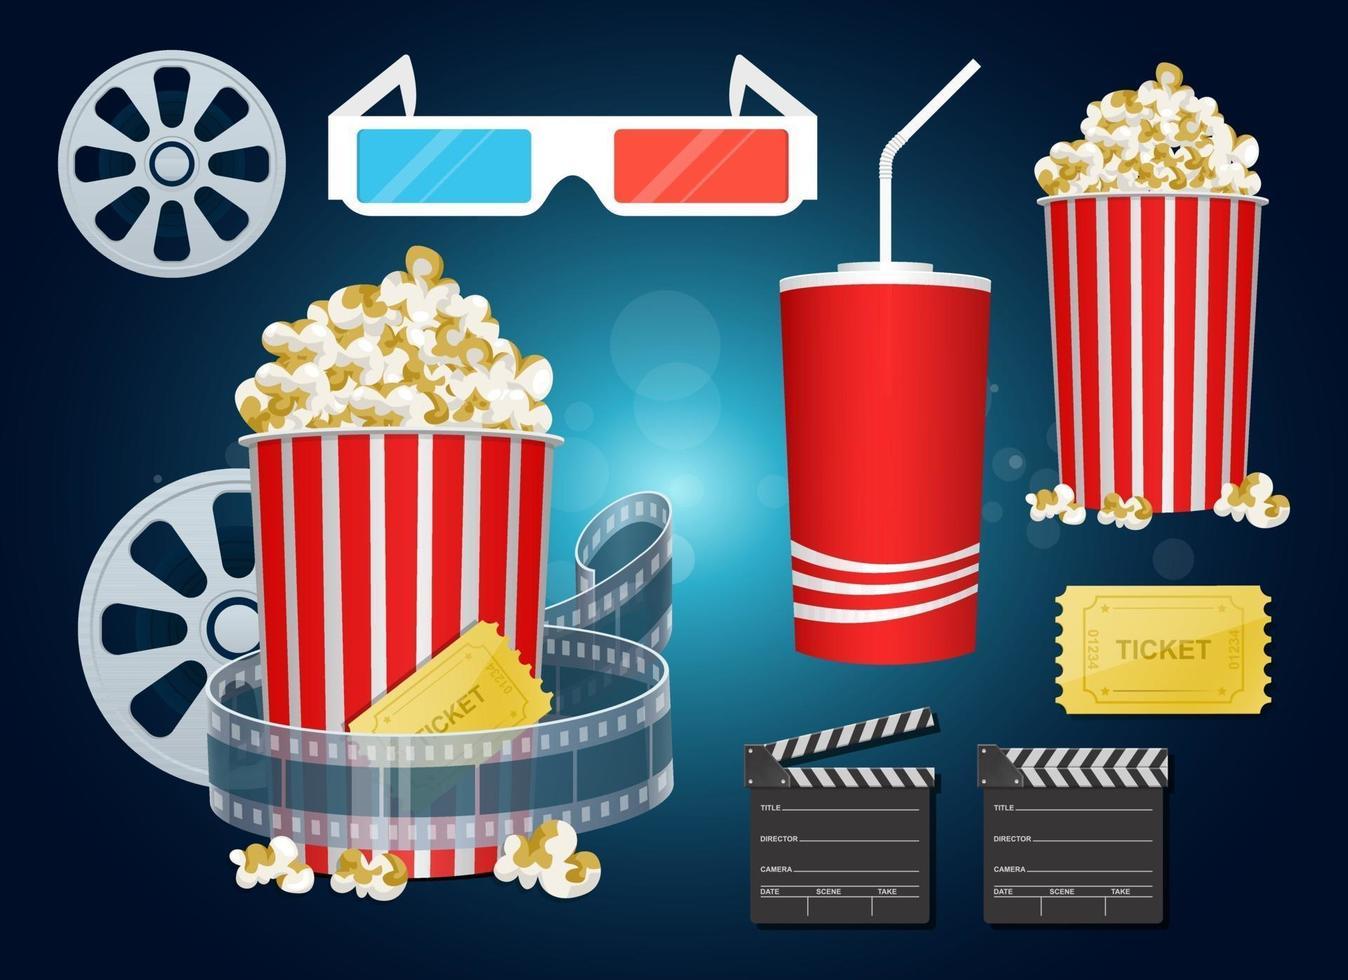 Movie time set vector design illustration set isolated on background